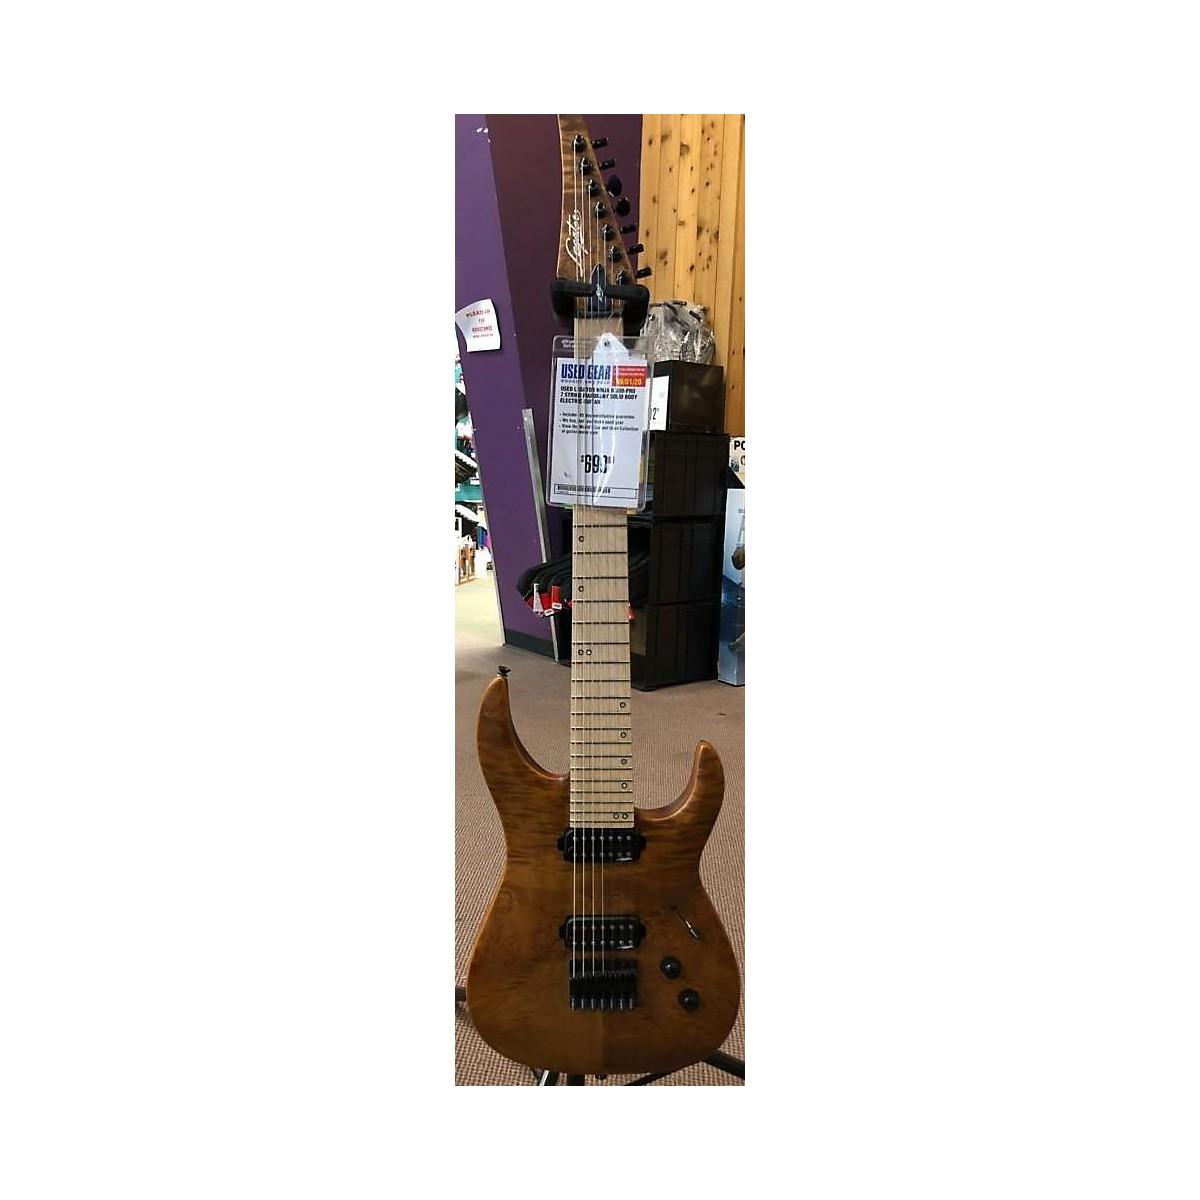 Legator Ninja R 300-pRO 7 STRING Solid Body Electric Guitar